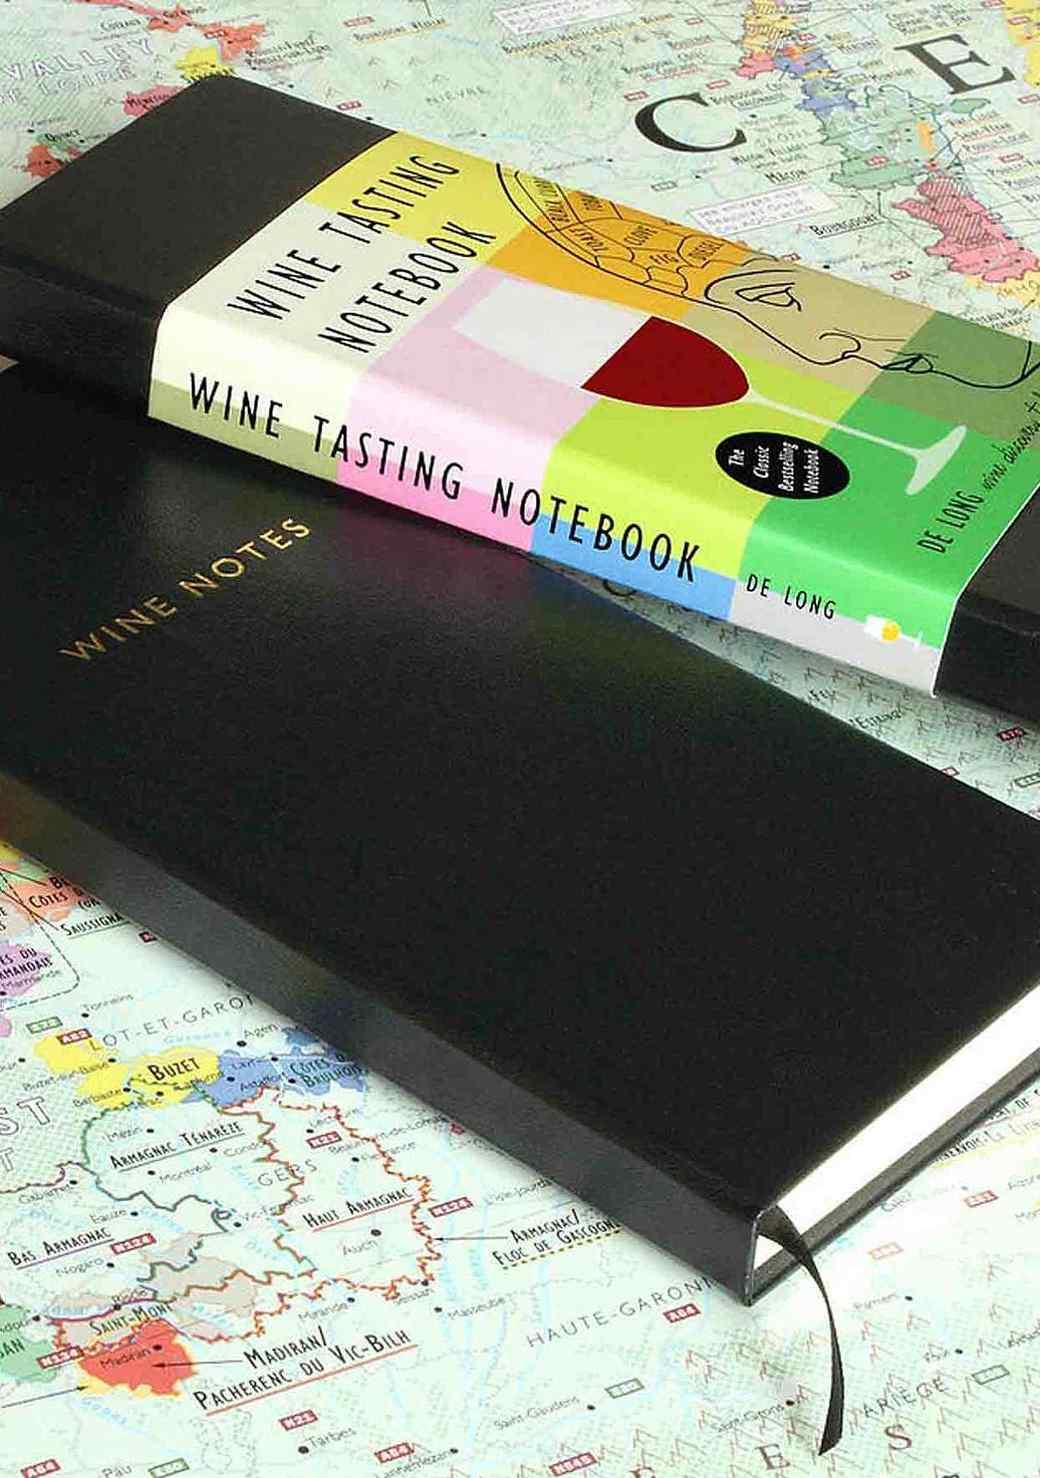 delong-wine-notebook-1215.jpg (skyword:209212)